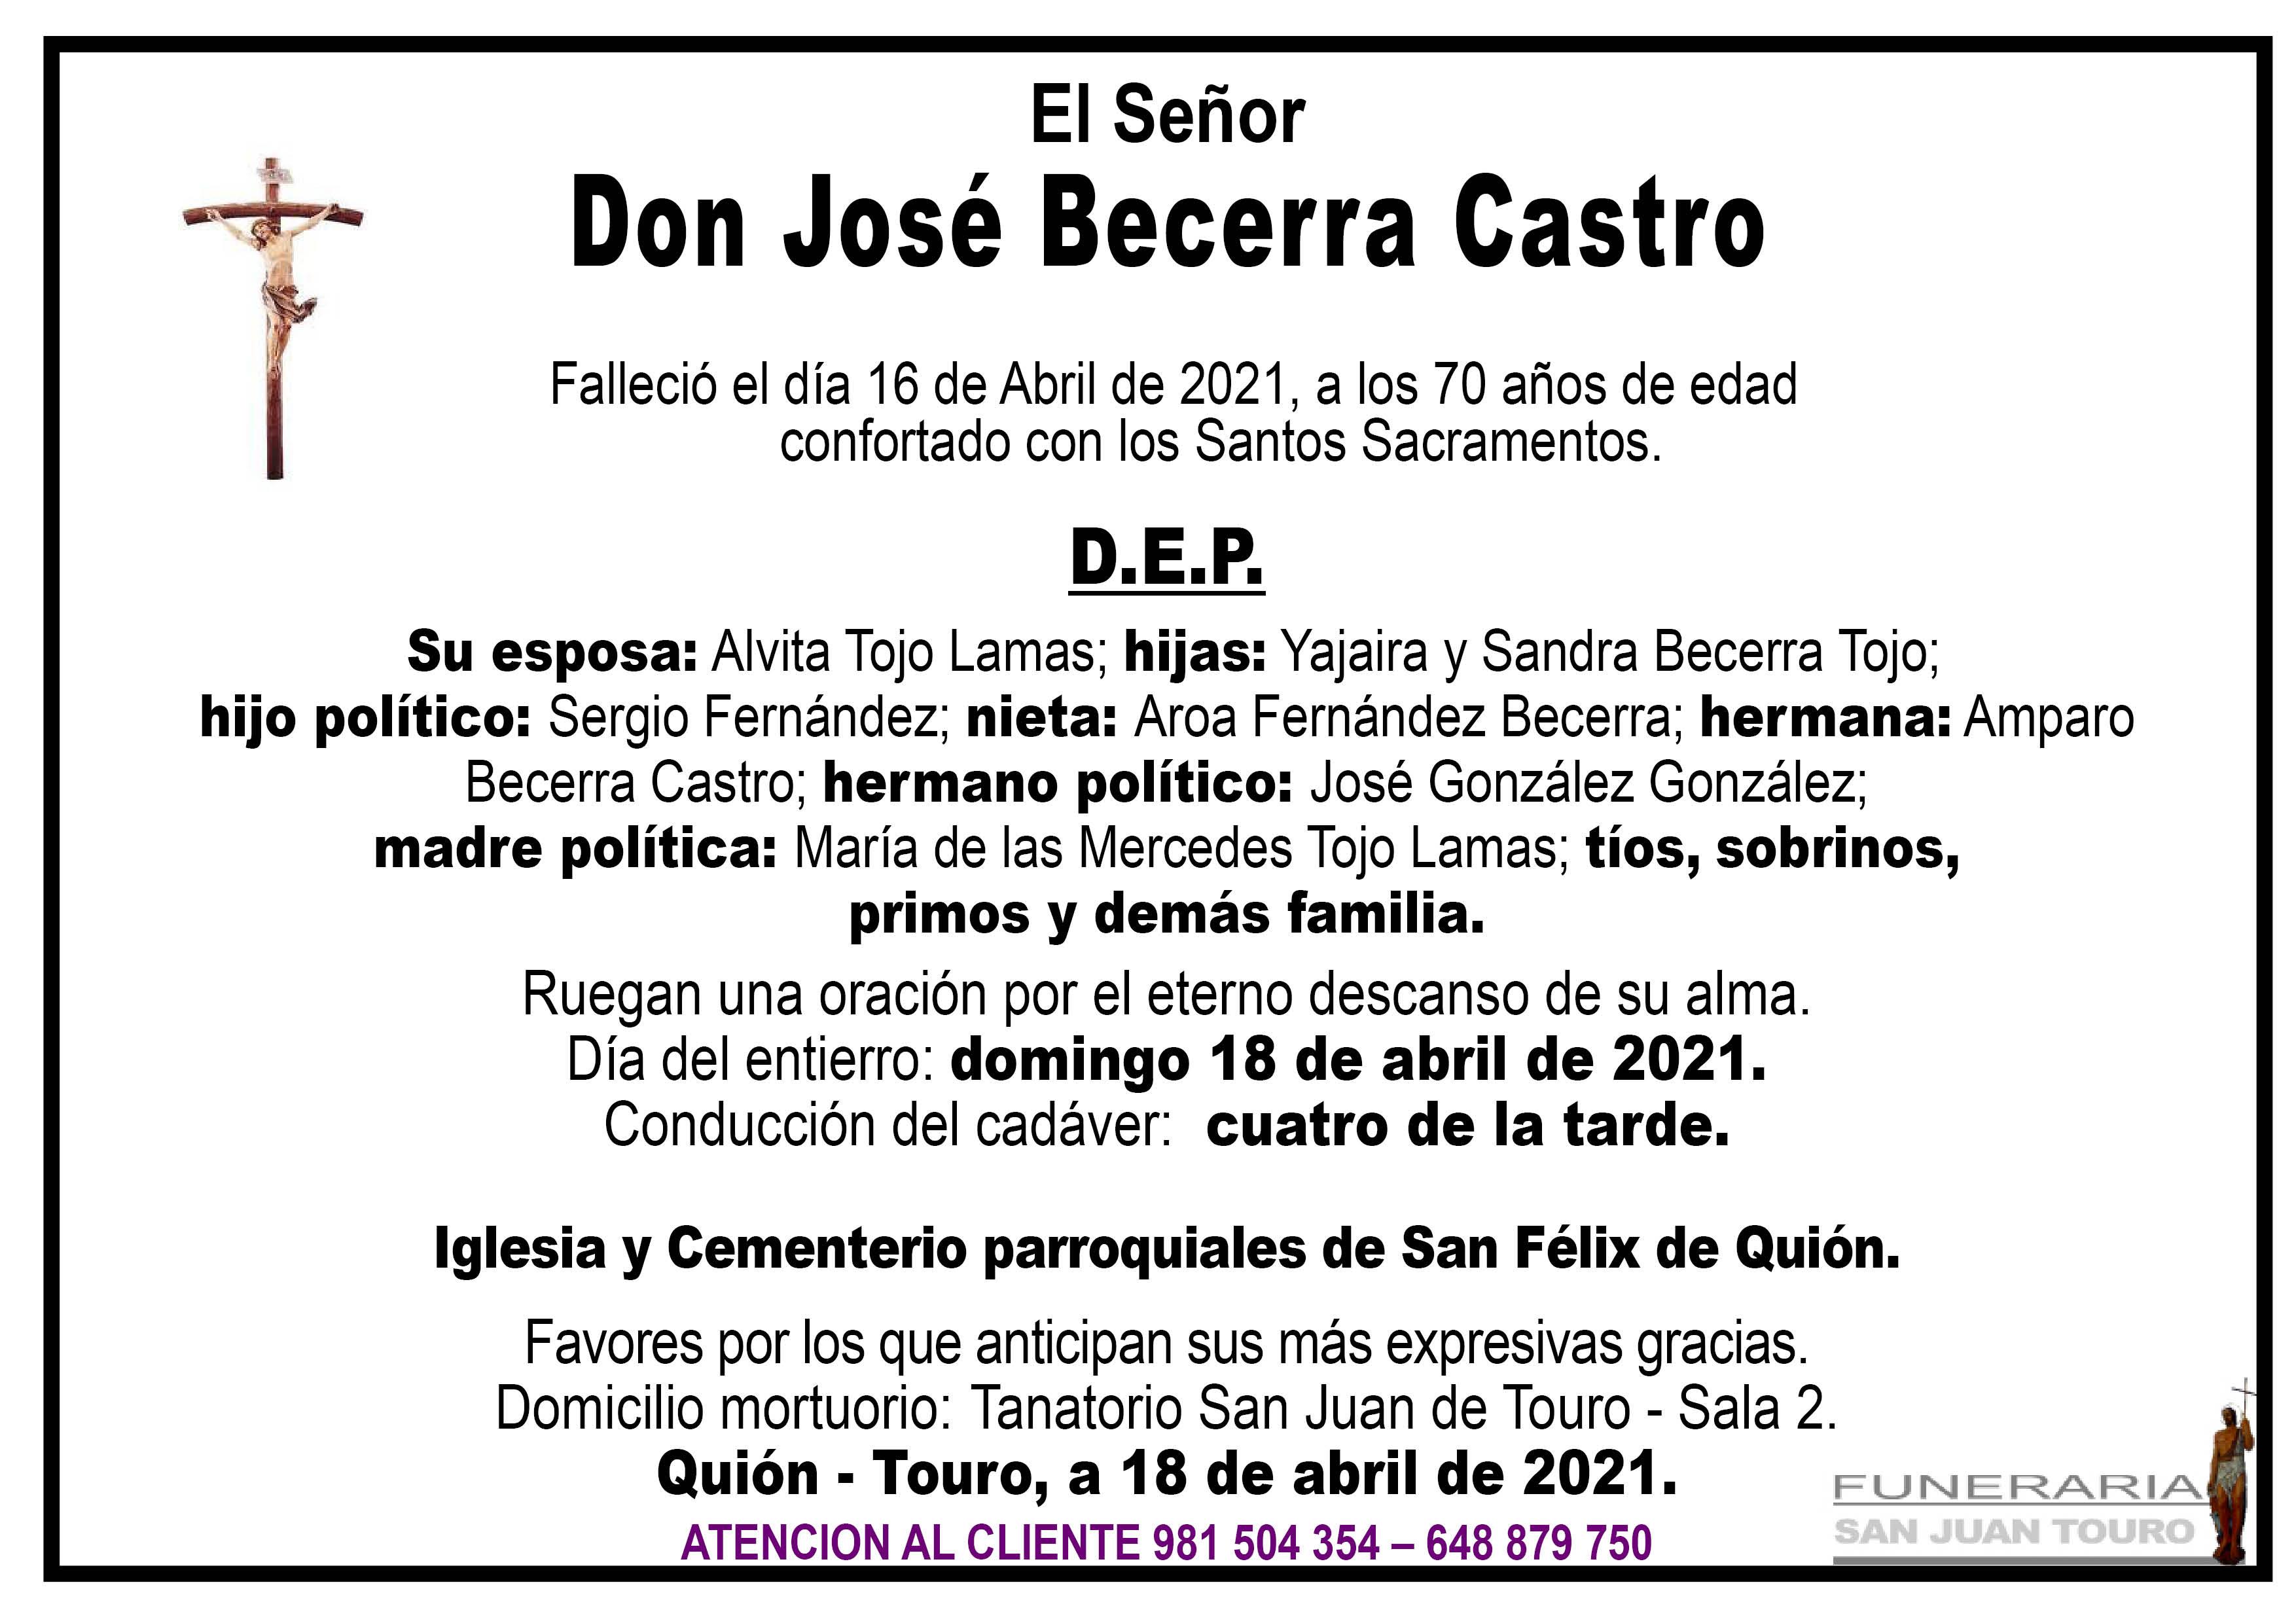 Esquela de SEPELIO DE DON JOSÉ BECERRA CASTRO